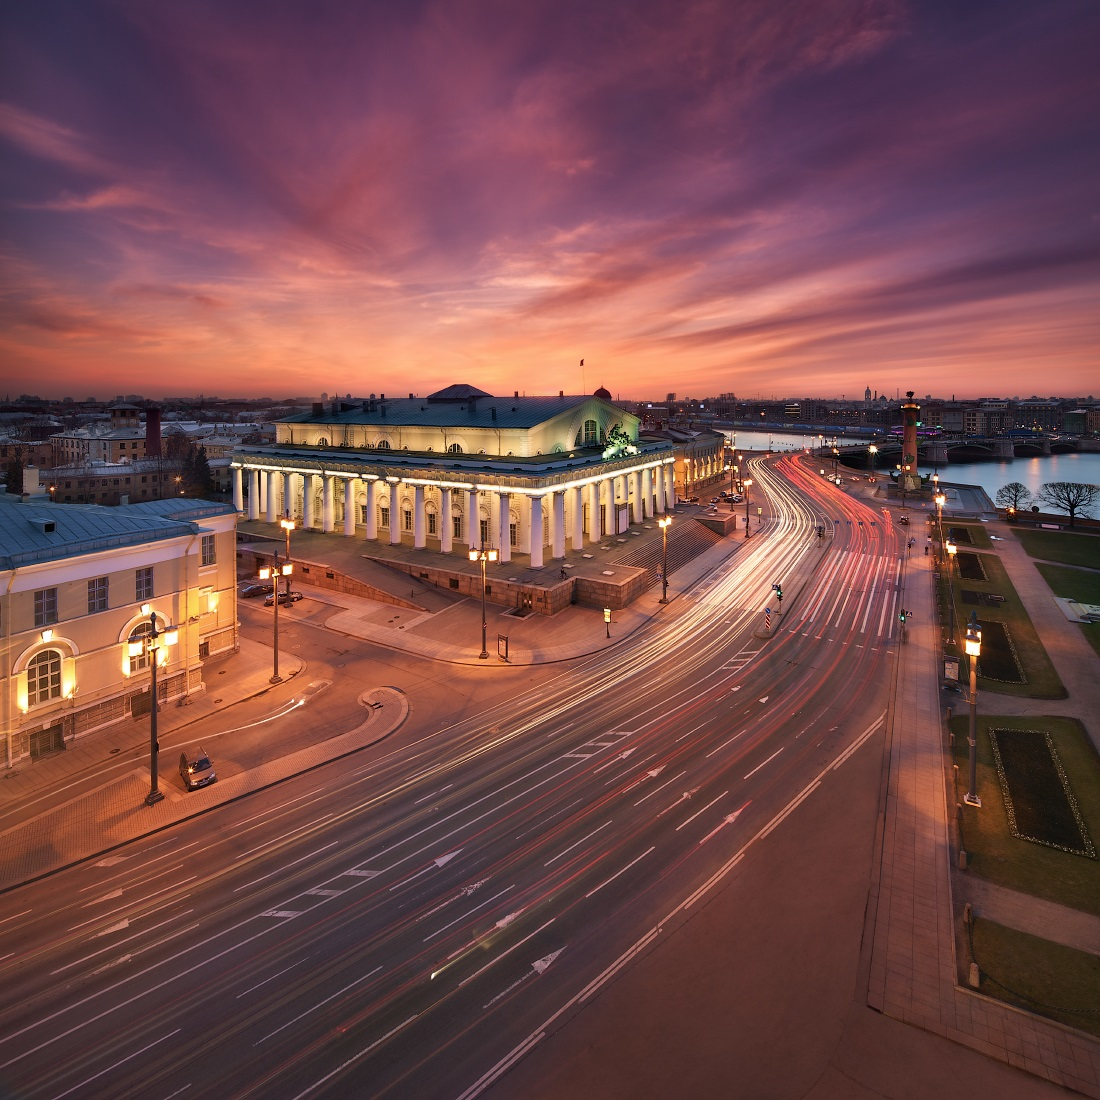 Night Saint Petersburg: Amazing photos of the city by Sergey Louks - 39